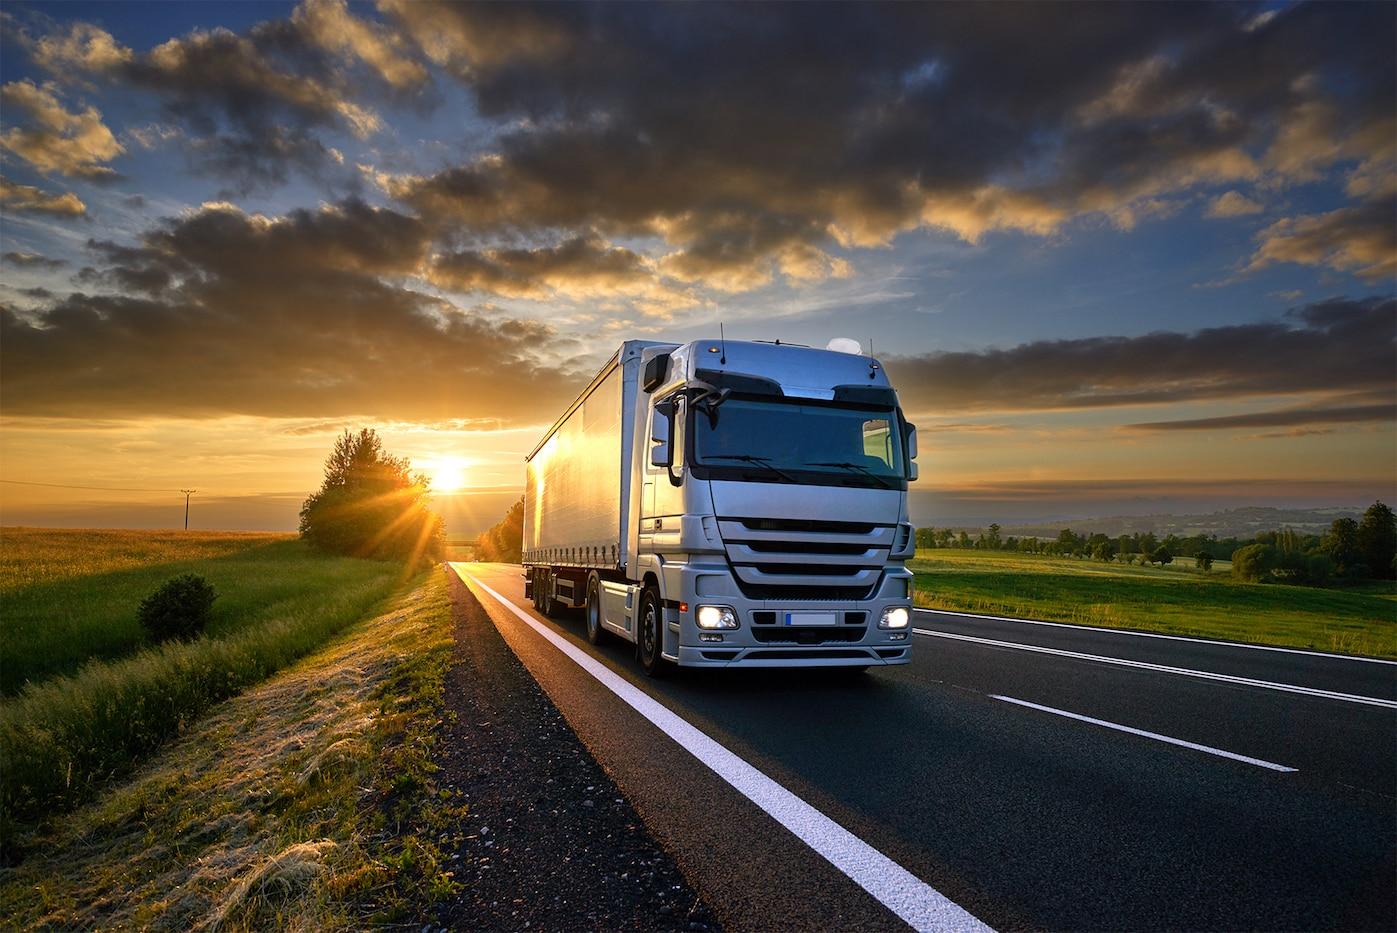 Rastreadores Autotrac ganham funcionalidade que alerta sobre trechos com alto índice de acidentes